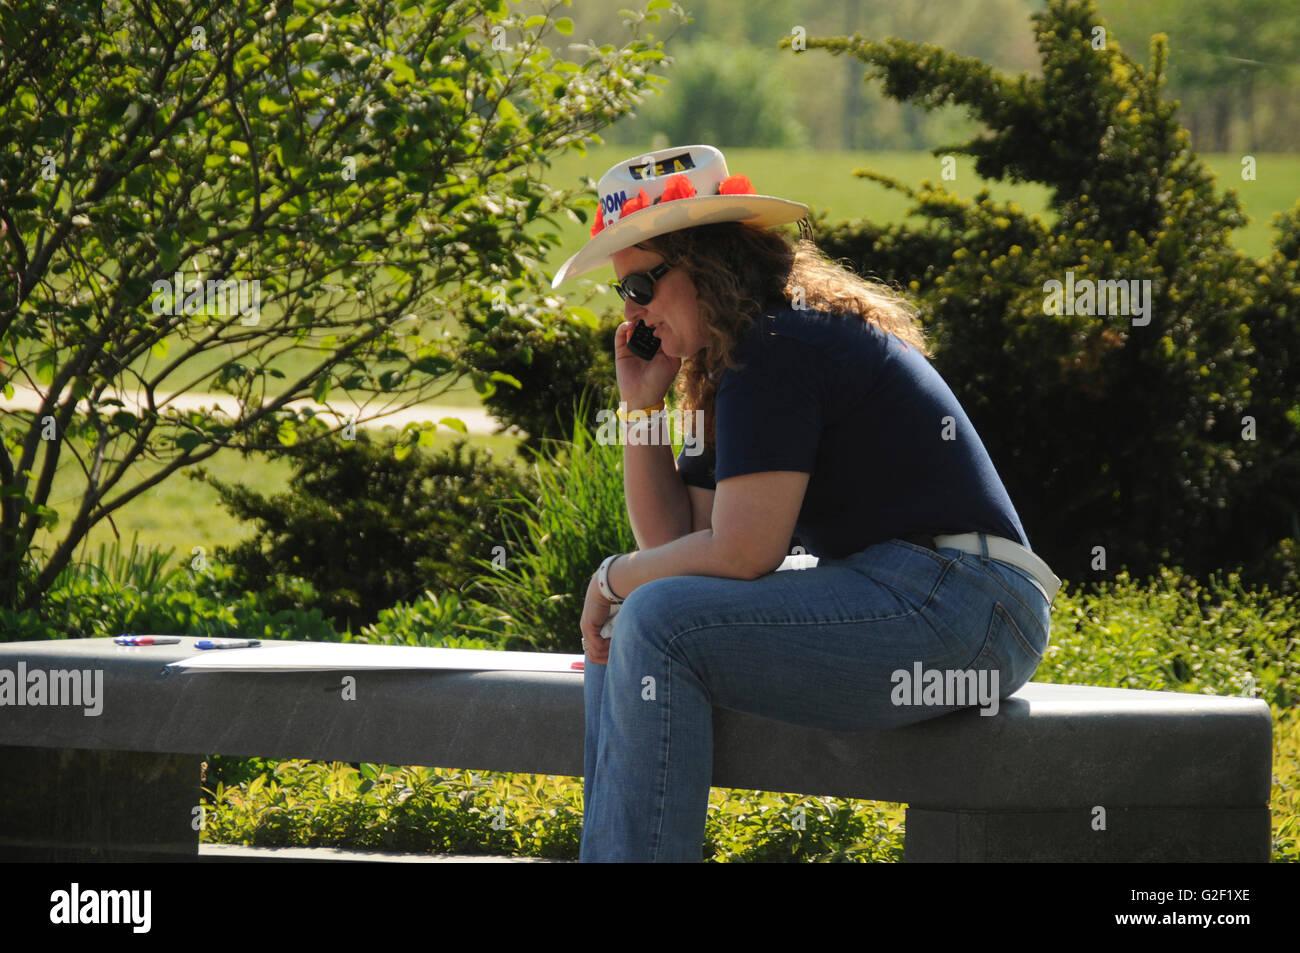 Tea Party demonstrator in Washington DC at the Washington Monument talks on the phone - Stock Image